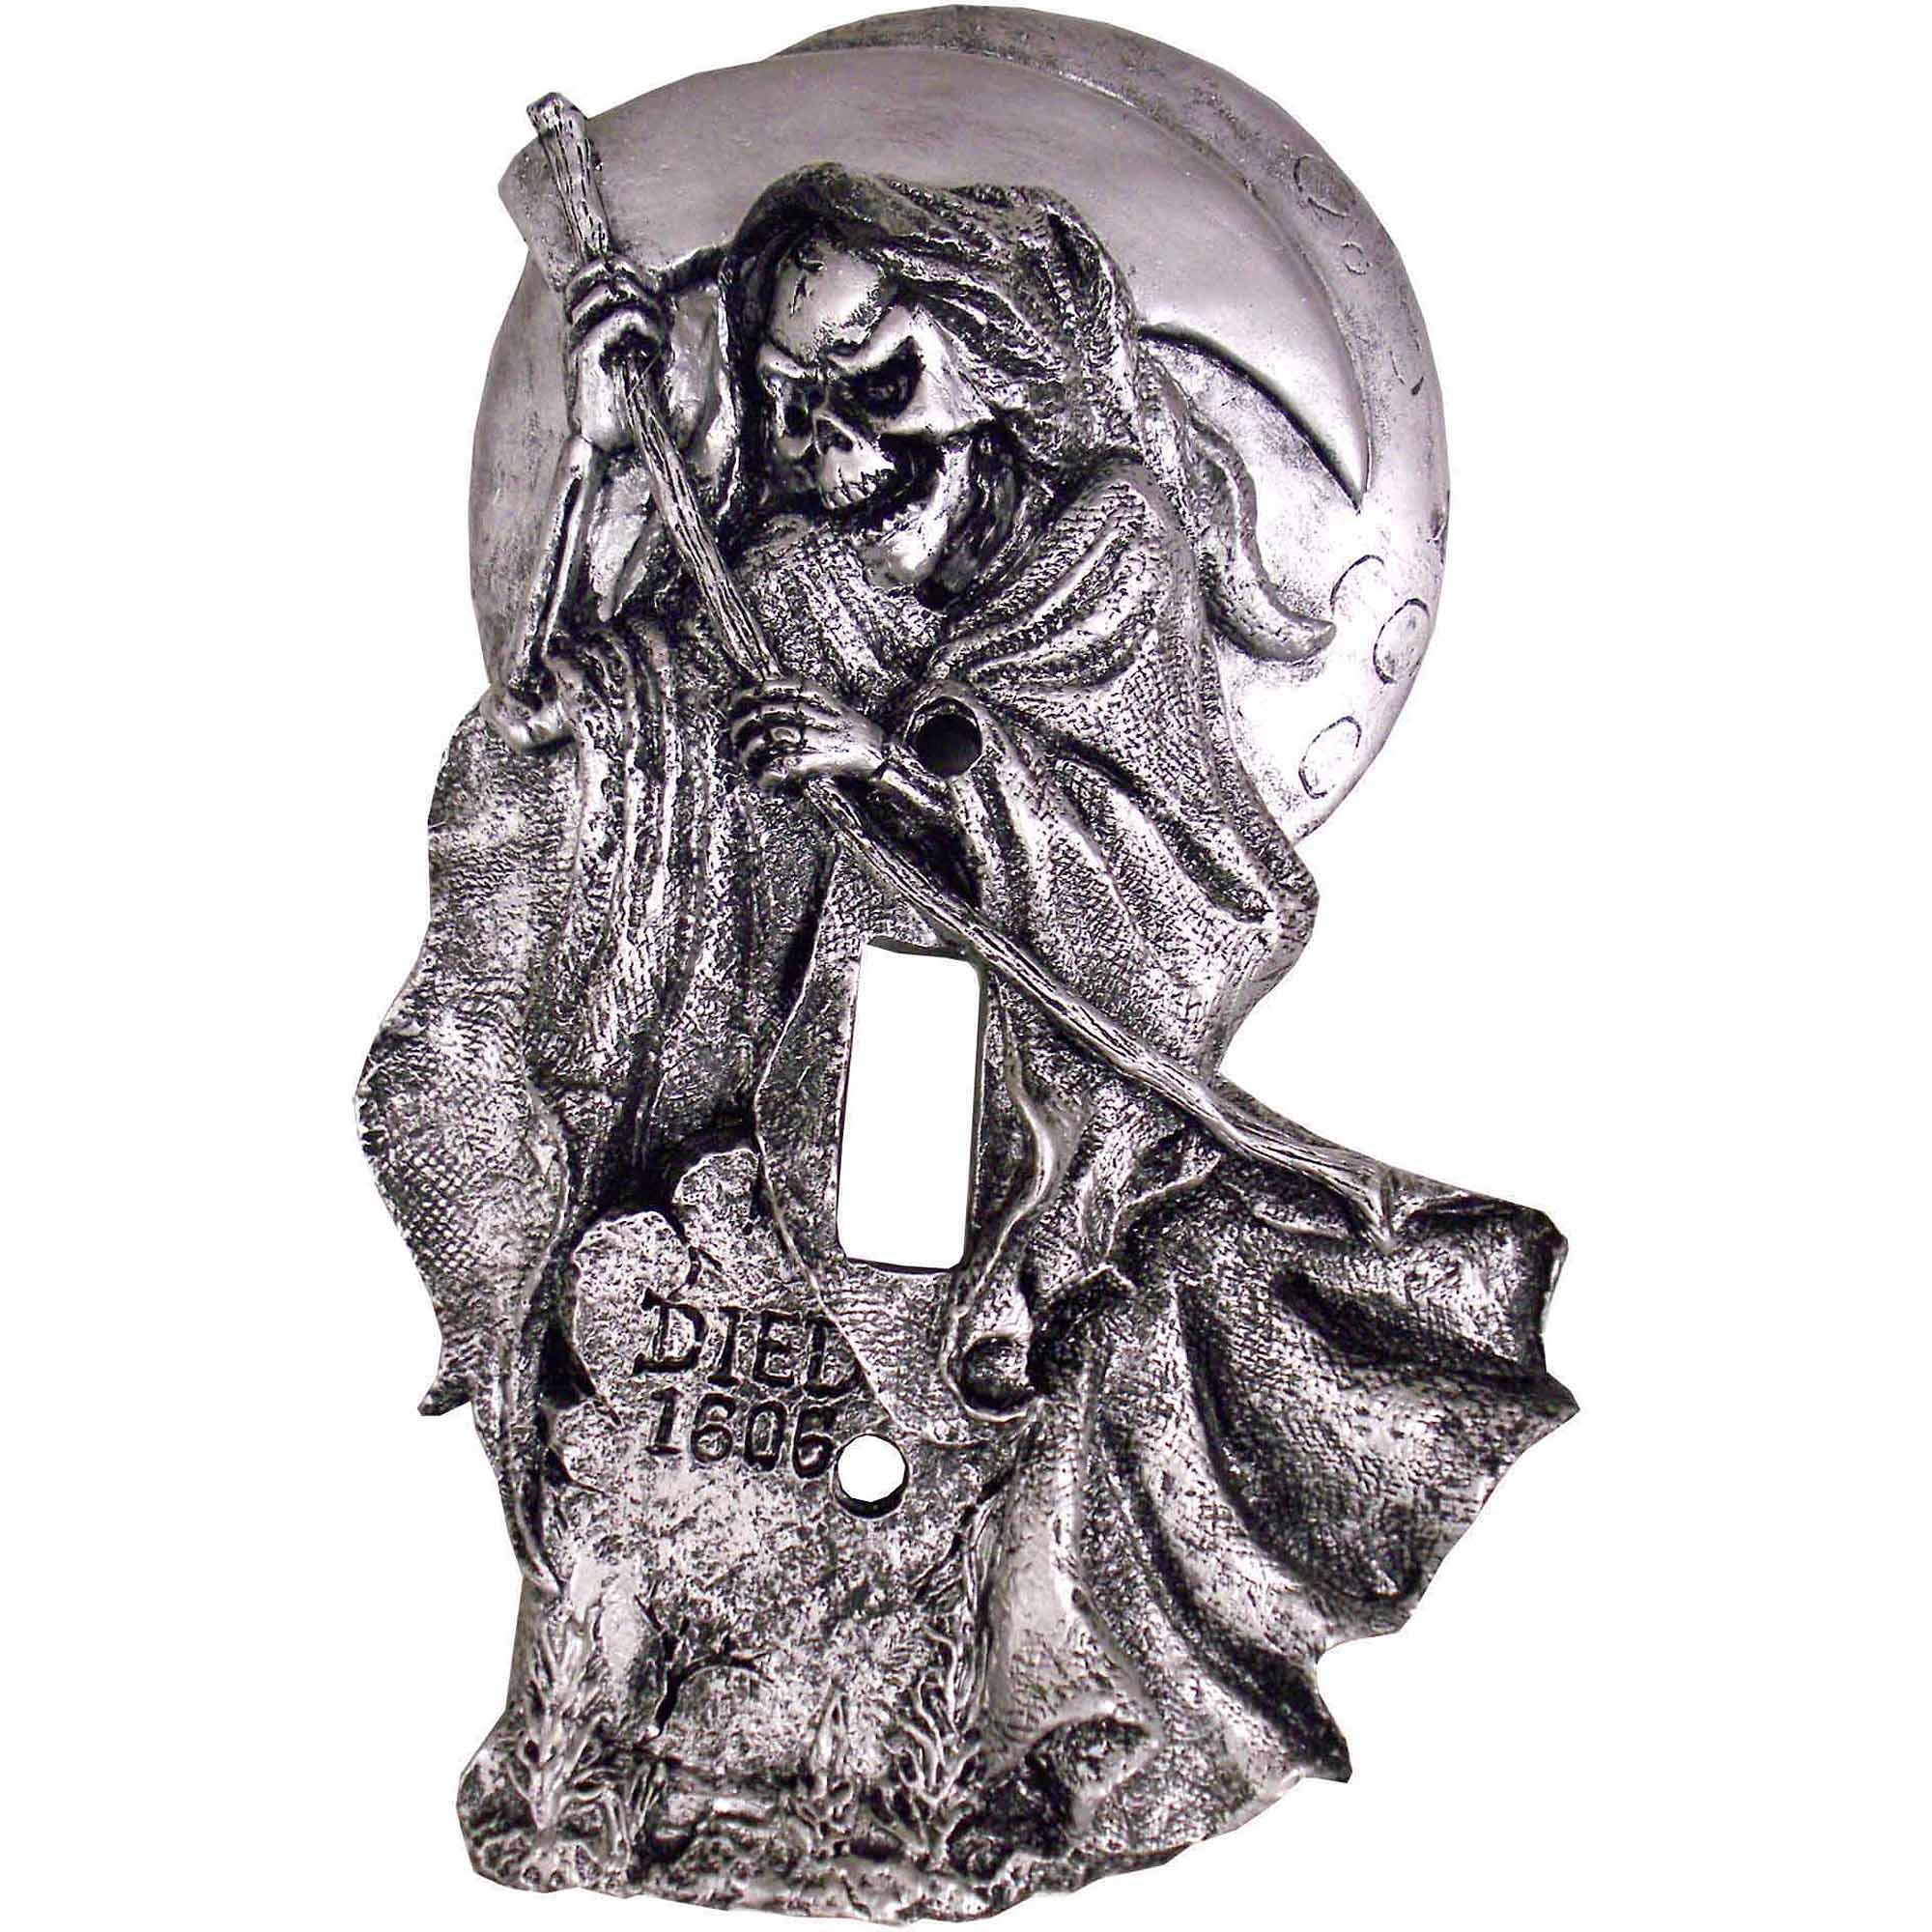 Drawn grim reaper halloween Halloween Switch Walmart Grim